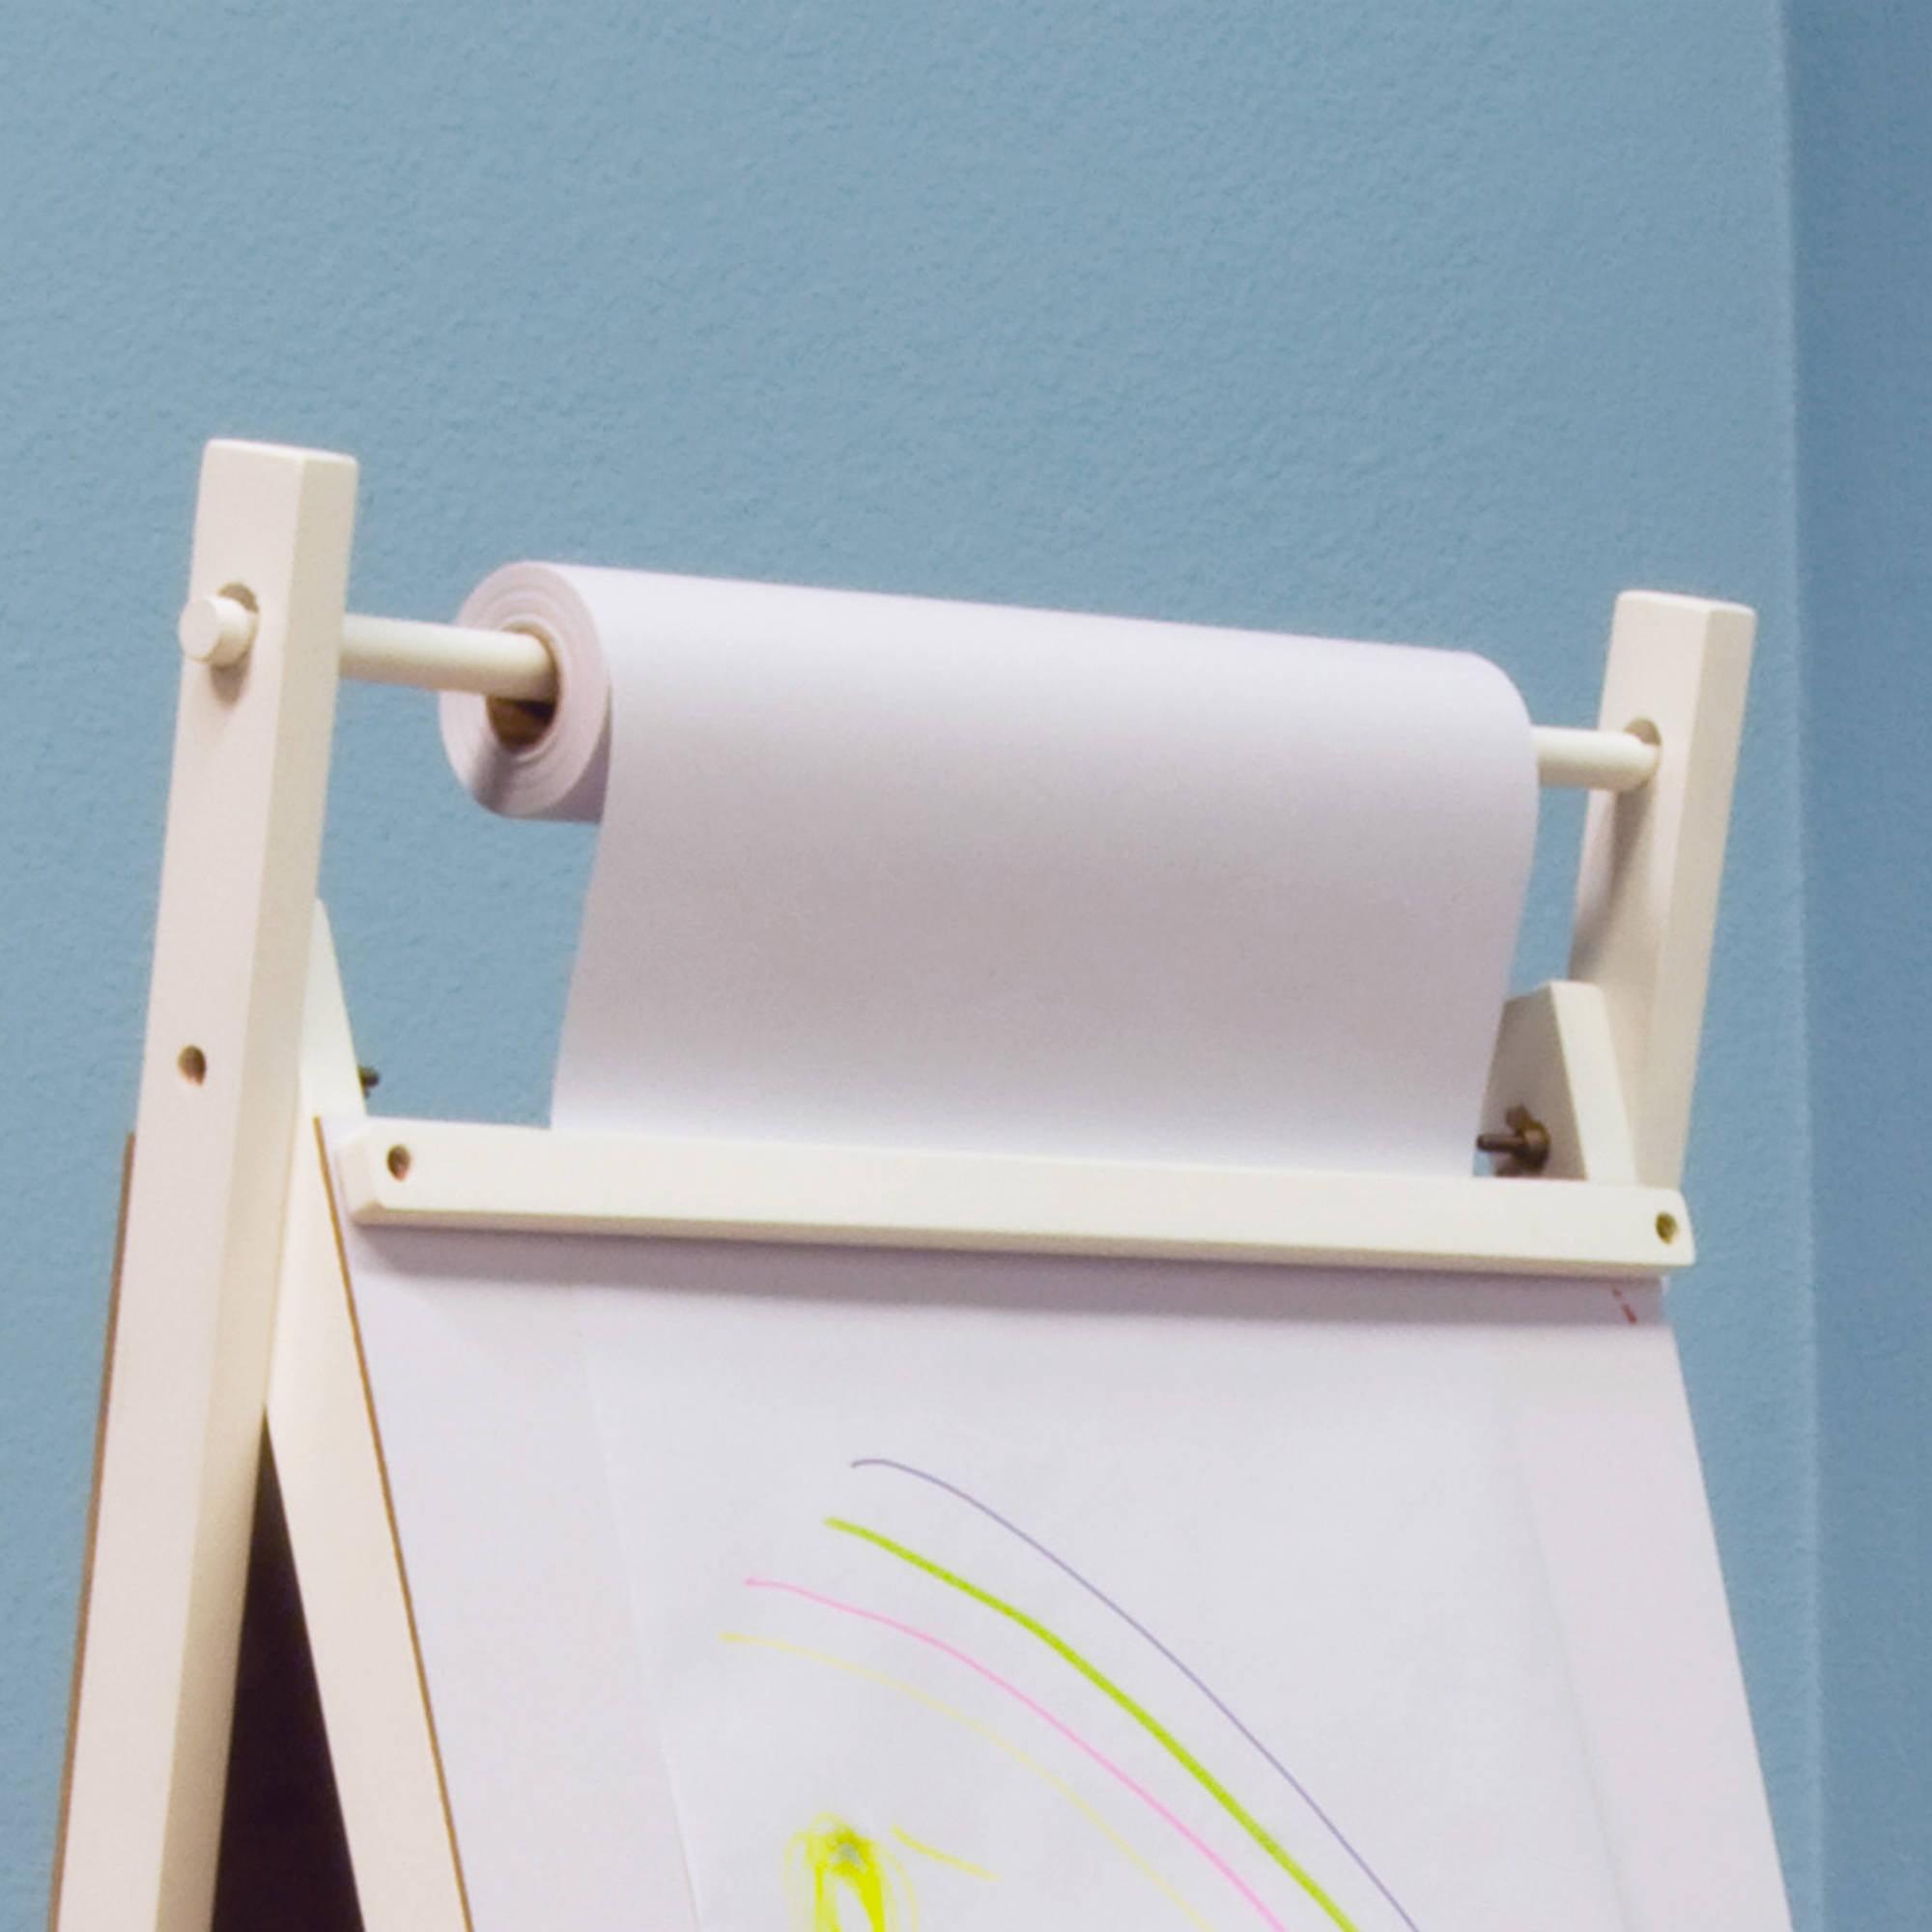 "Studio Designs Art Paper Roll Refill, 12"" x 75', Set of 2 by Studio Designs Inc"